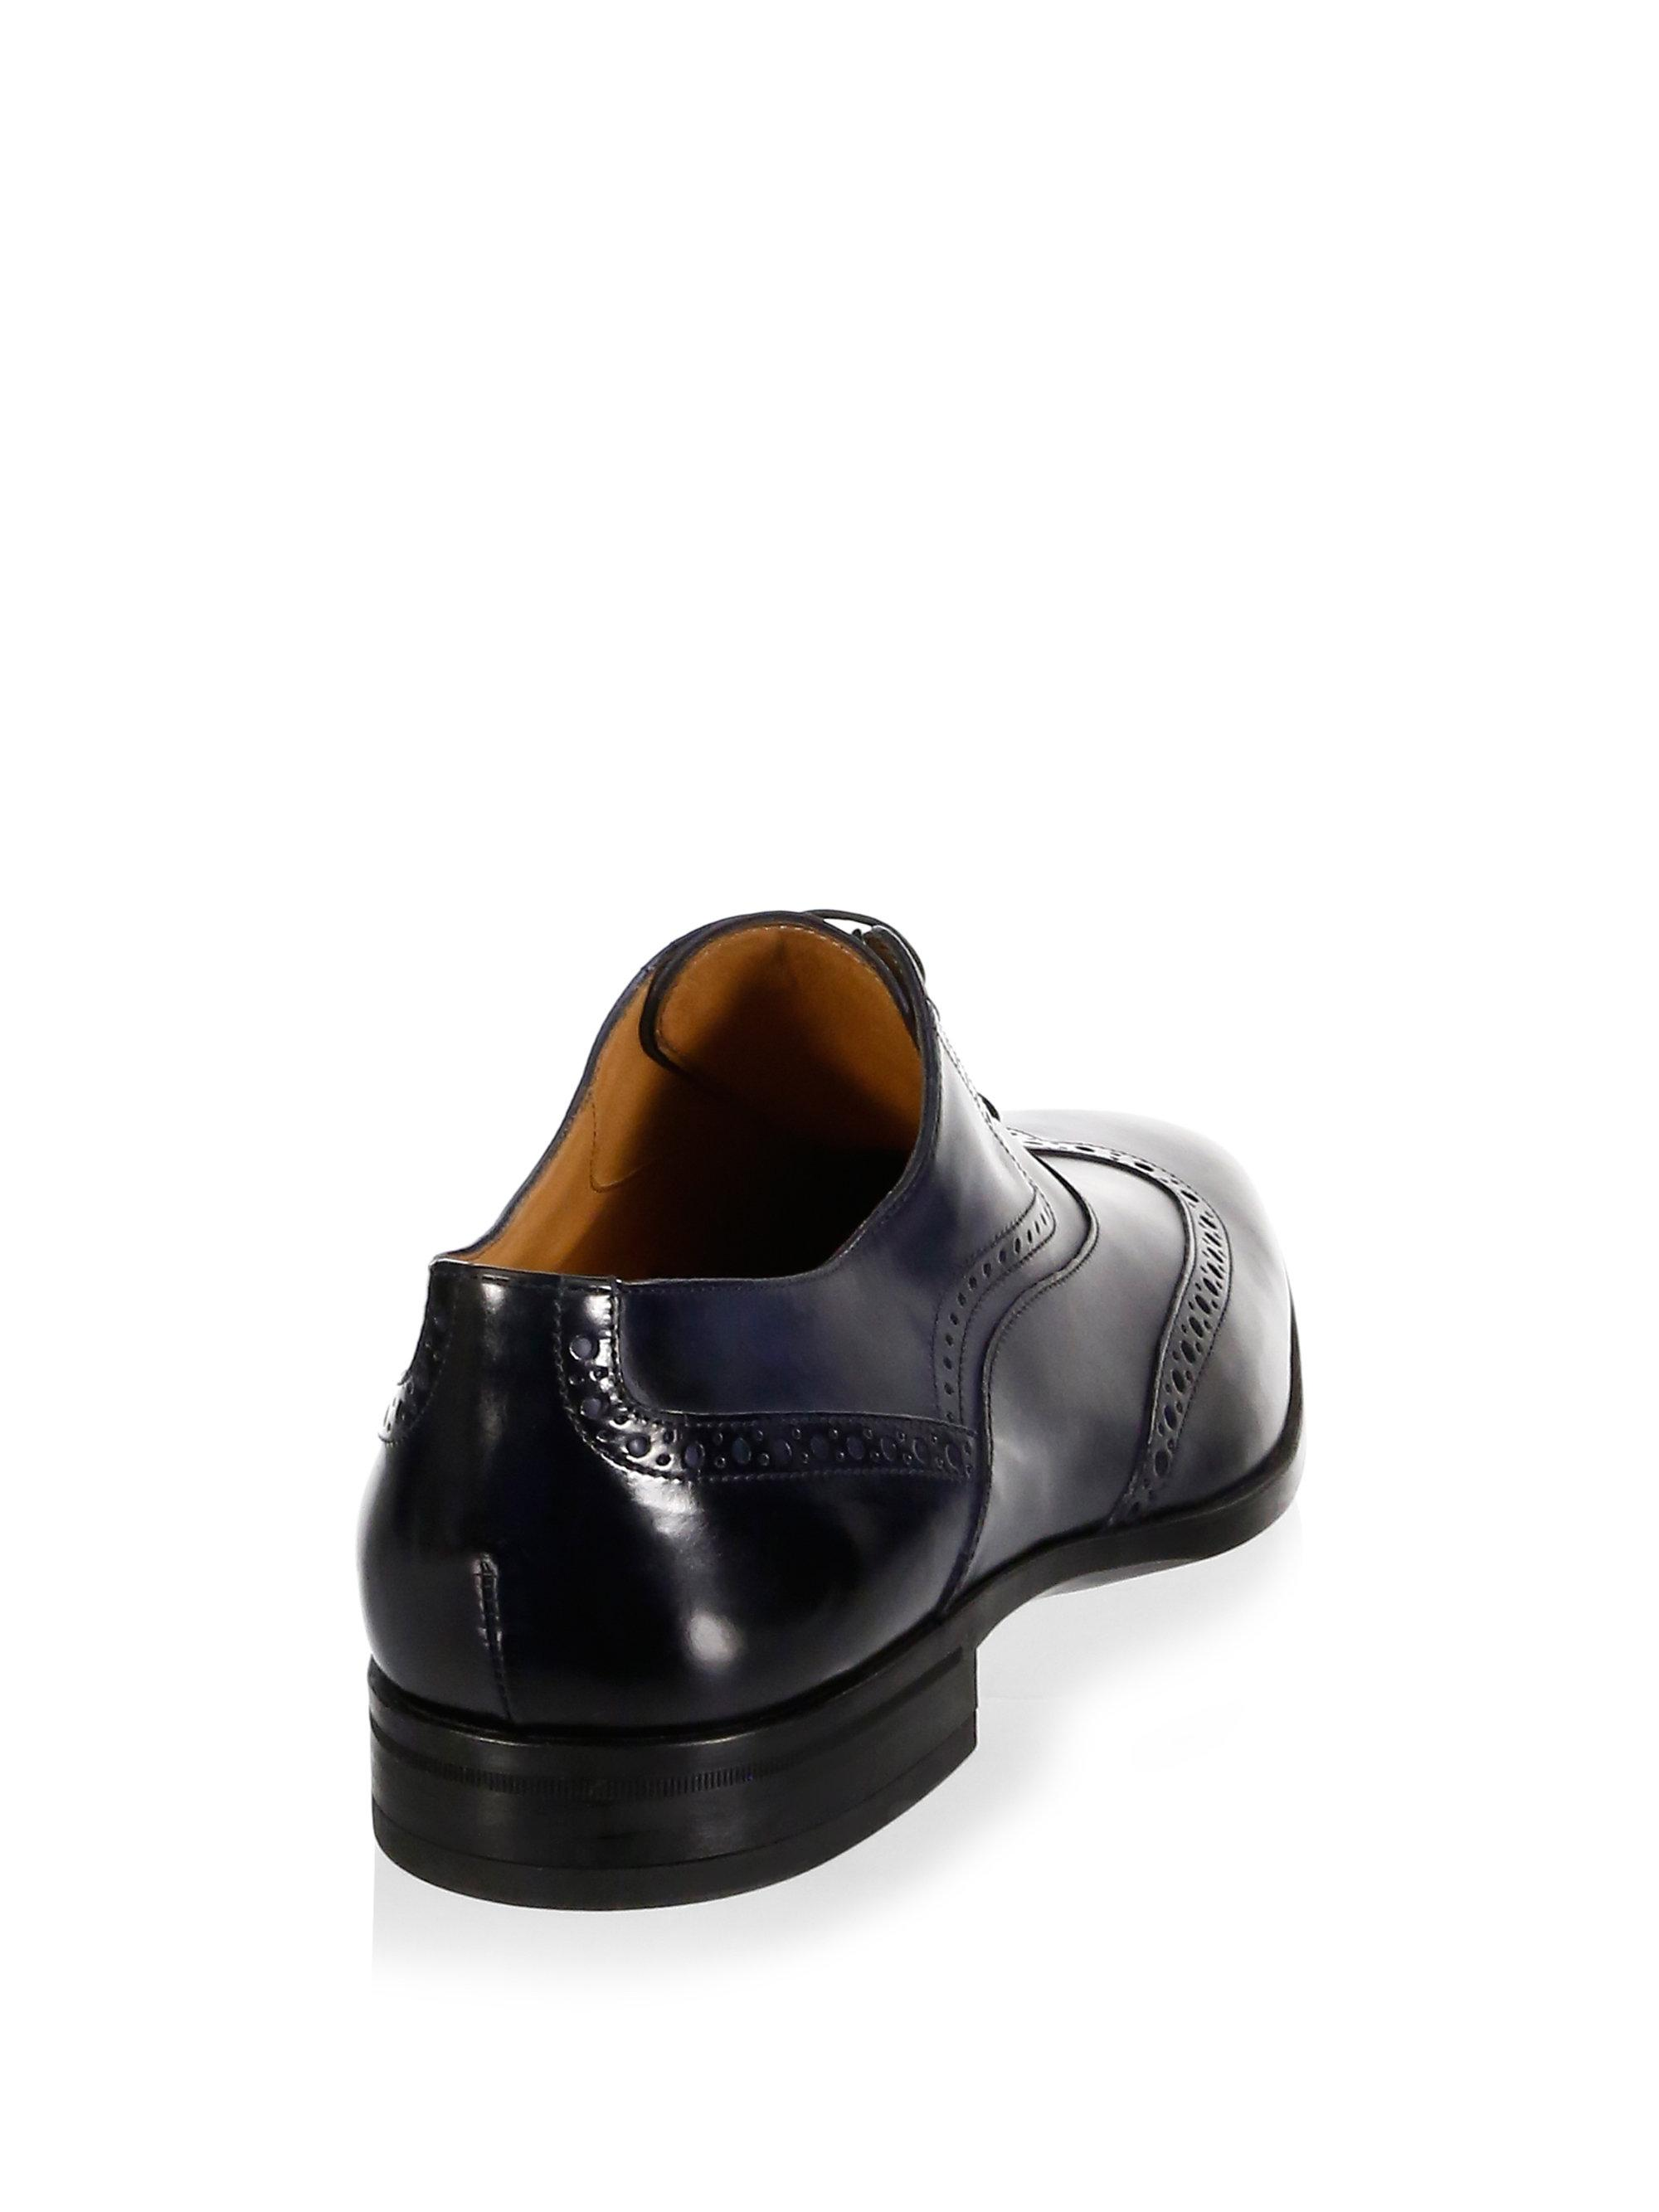 HUGO BOSS Kensington Wingtip Oxford Shoes M0bQJj1V3